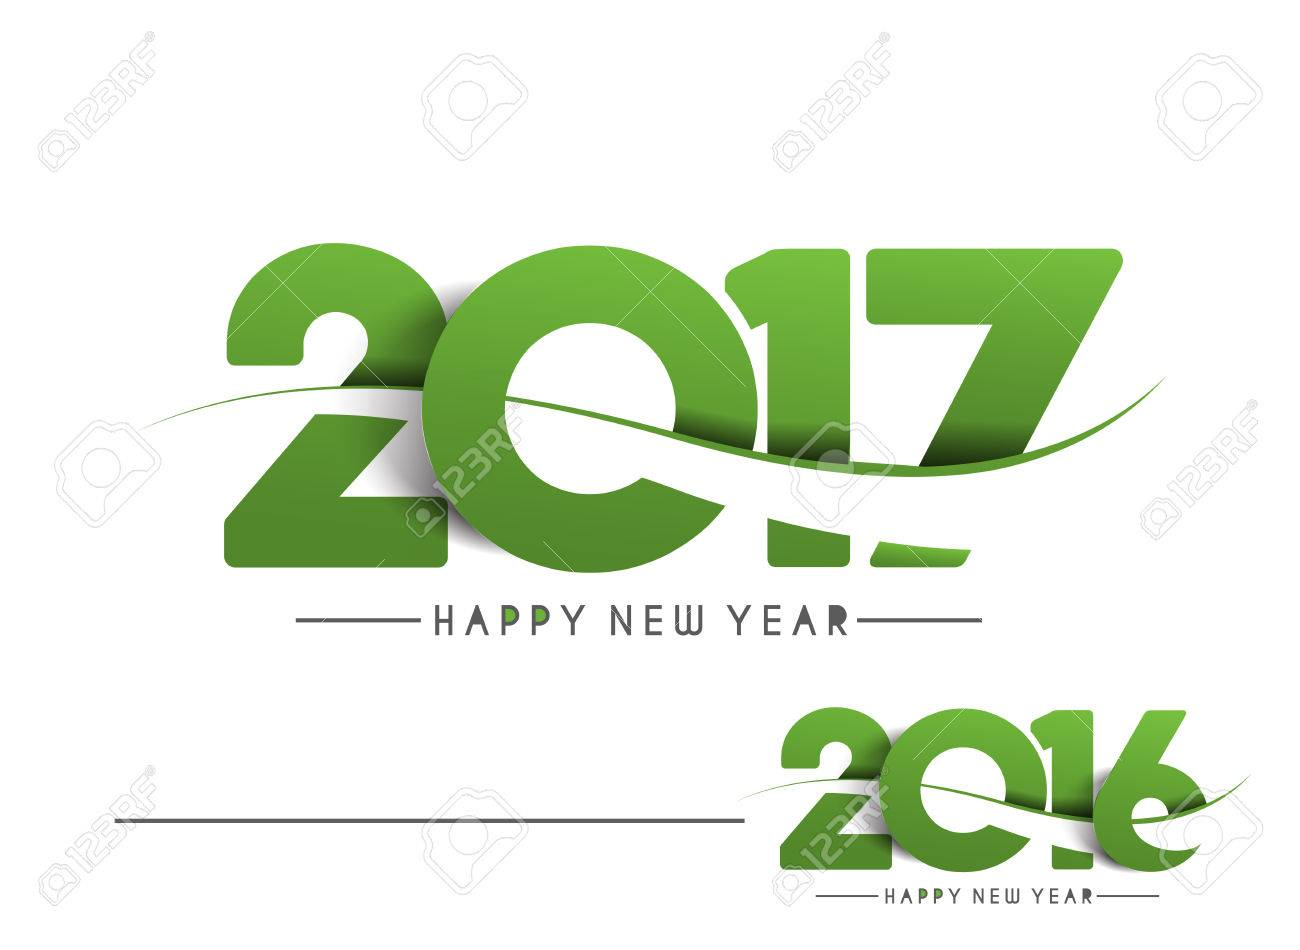 Happy new year 2017 & 2016 Text Design vector - 60488981